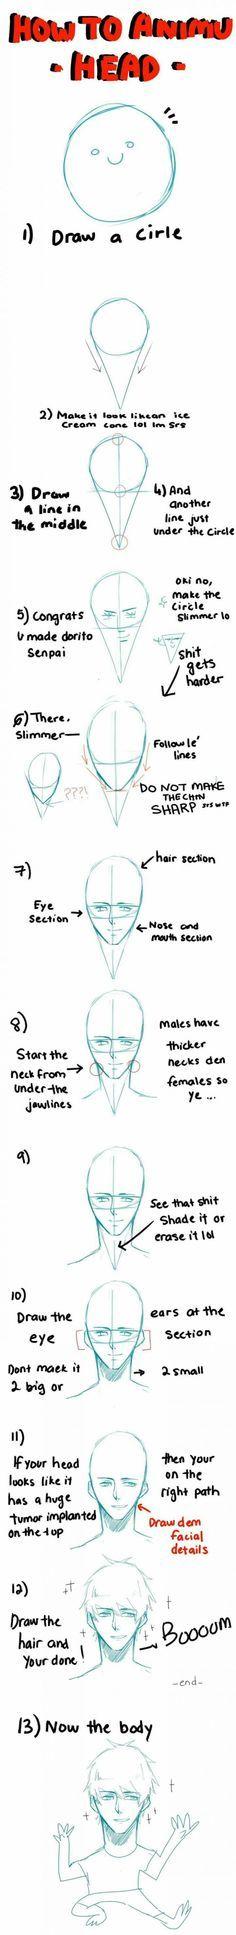 How to draw anime - 9GAG